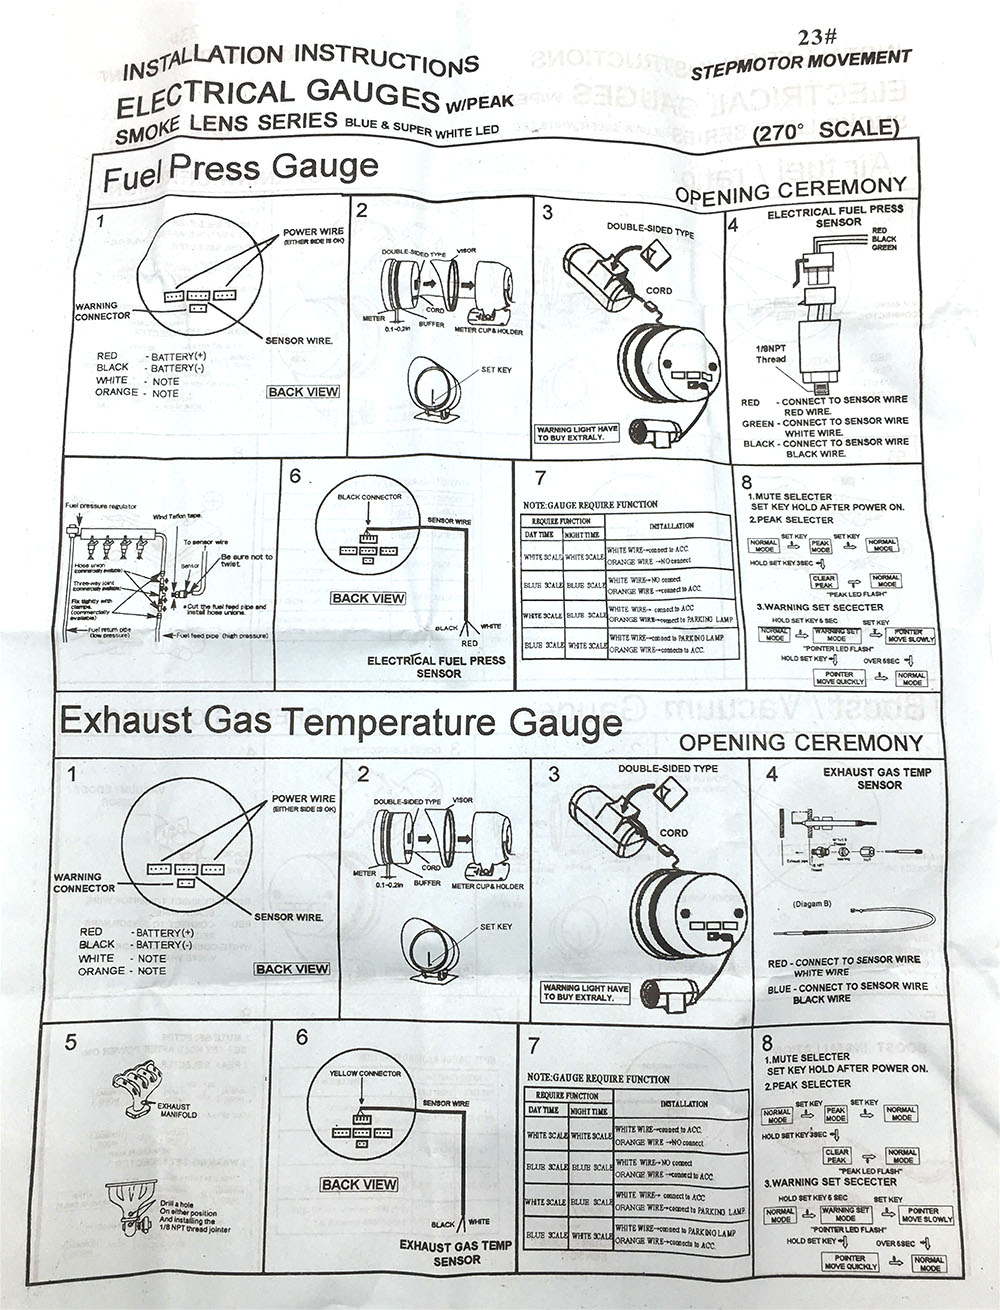 hight resolution of air fuel ratio gauge exhaust gas temperature gauge tachometer gauge boost gauge vacuum gauge oil temperature water temperature oil pressure gauge voltmeter